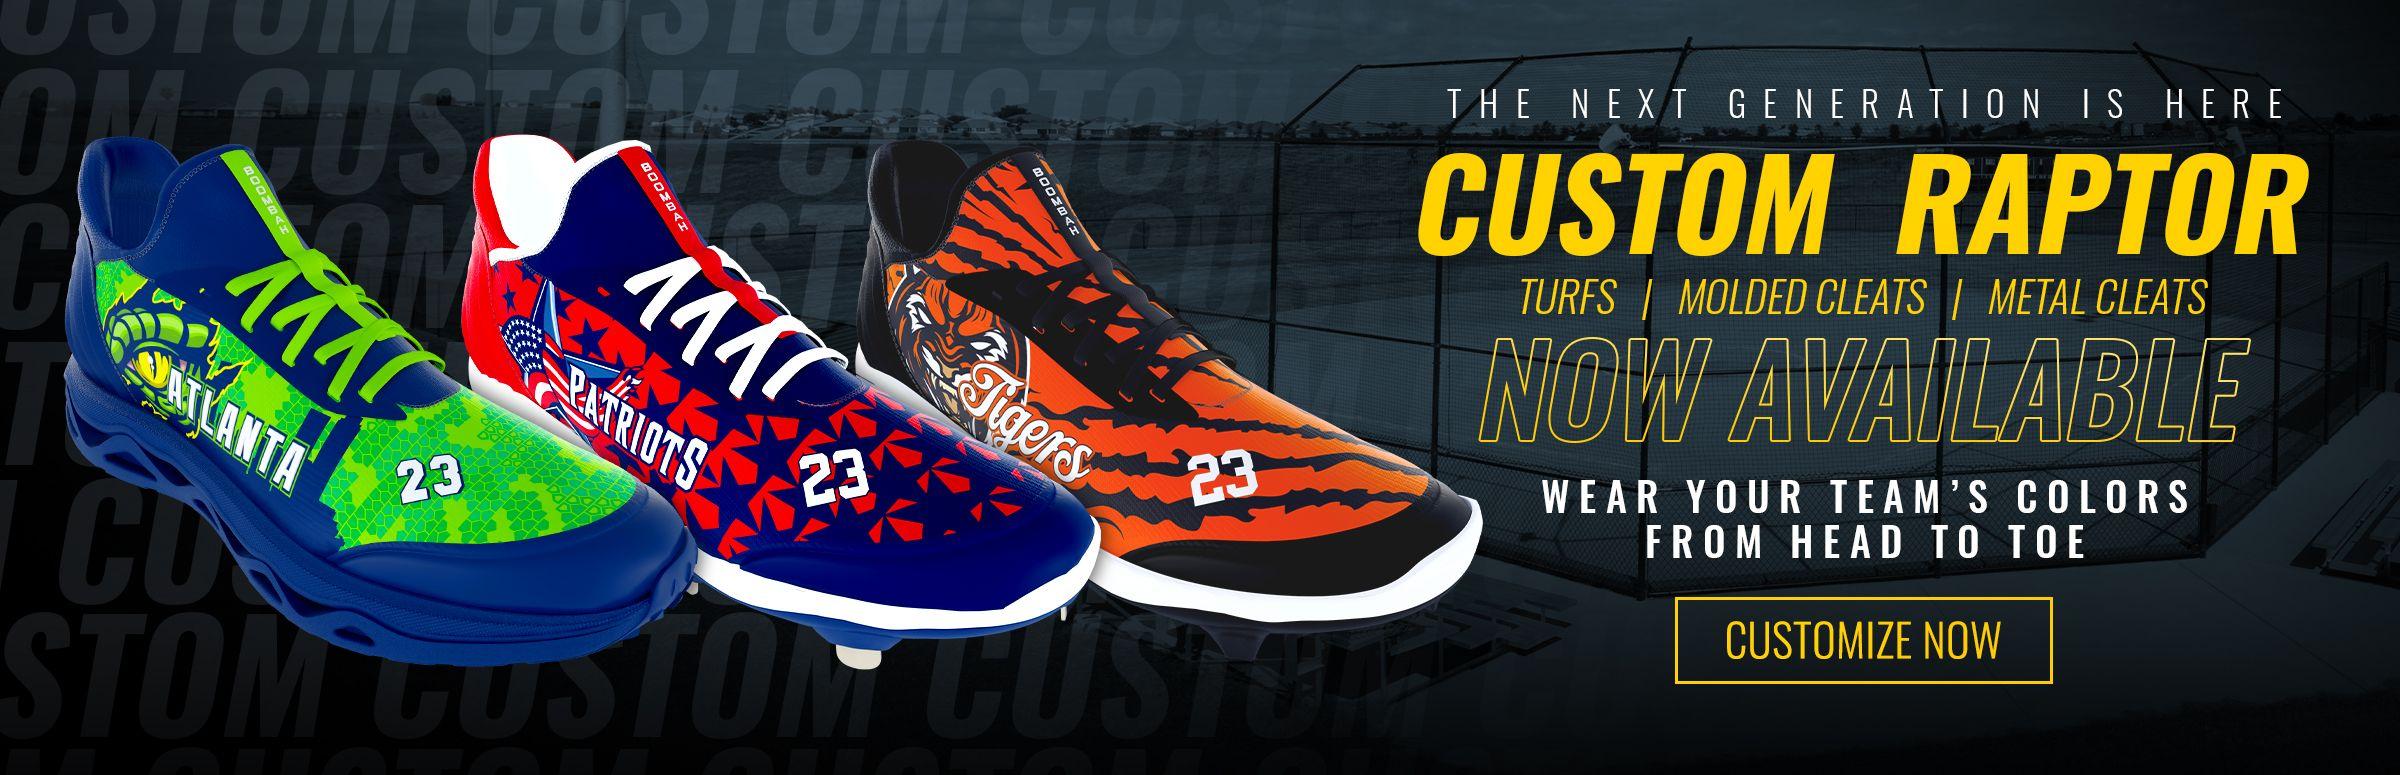 Custom Raptor Footwear - Now Available